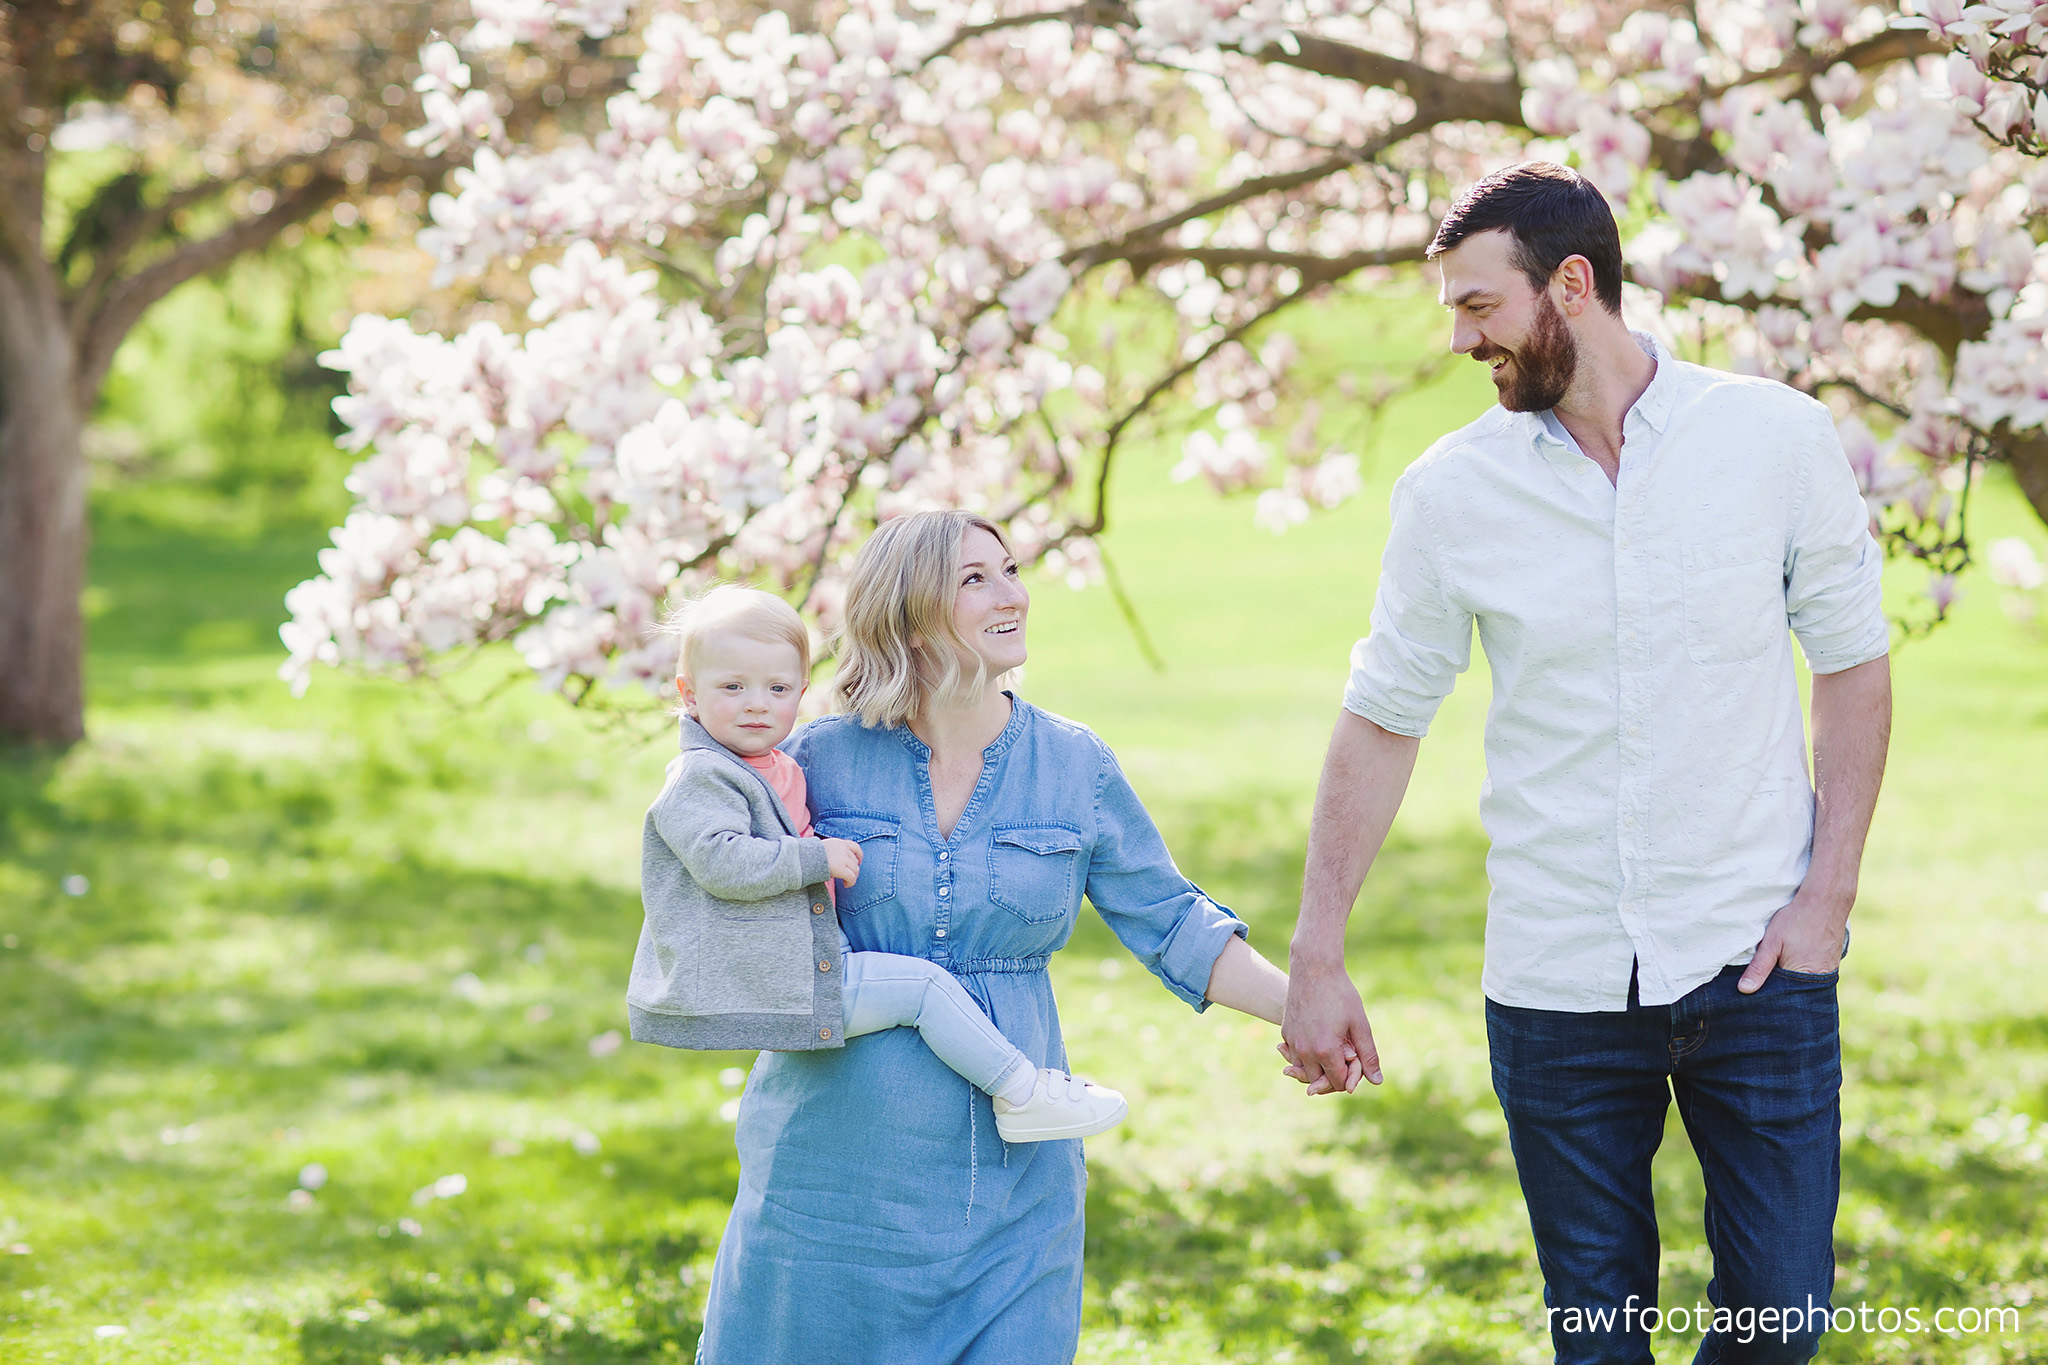 london_ontario_family_photographer-raw_footage_photography-spring_blossom_mini_sessions-magnolia-springbank_park013.jpg